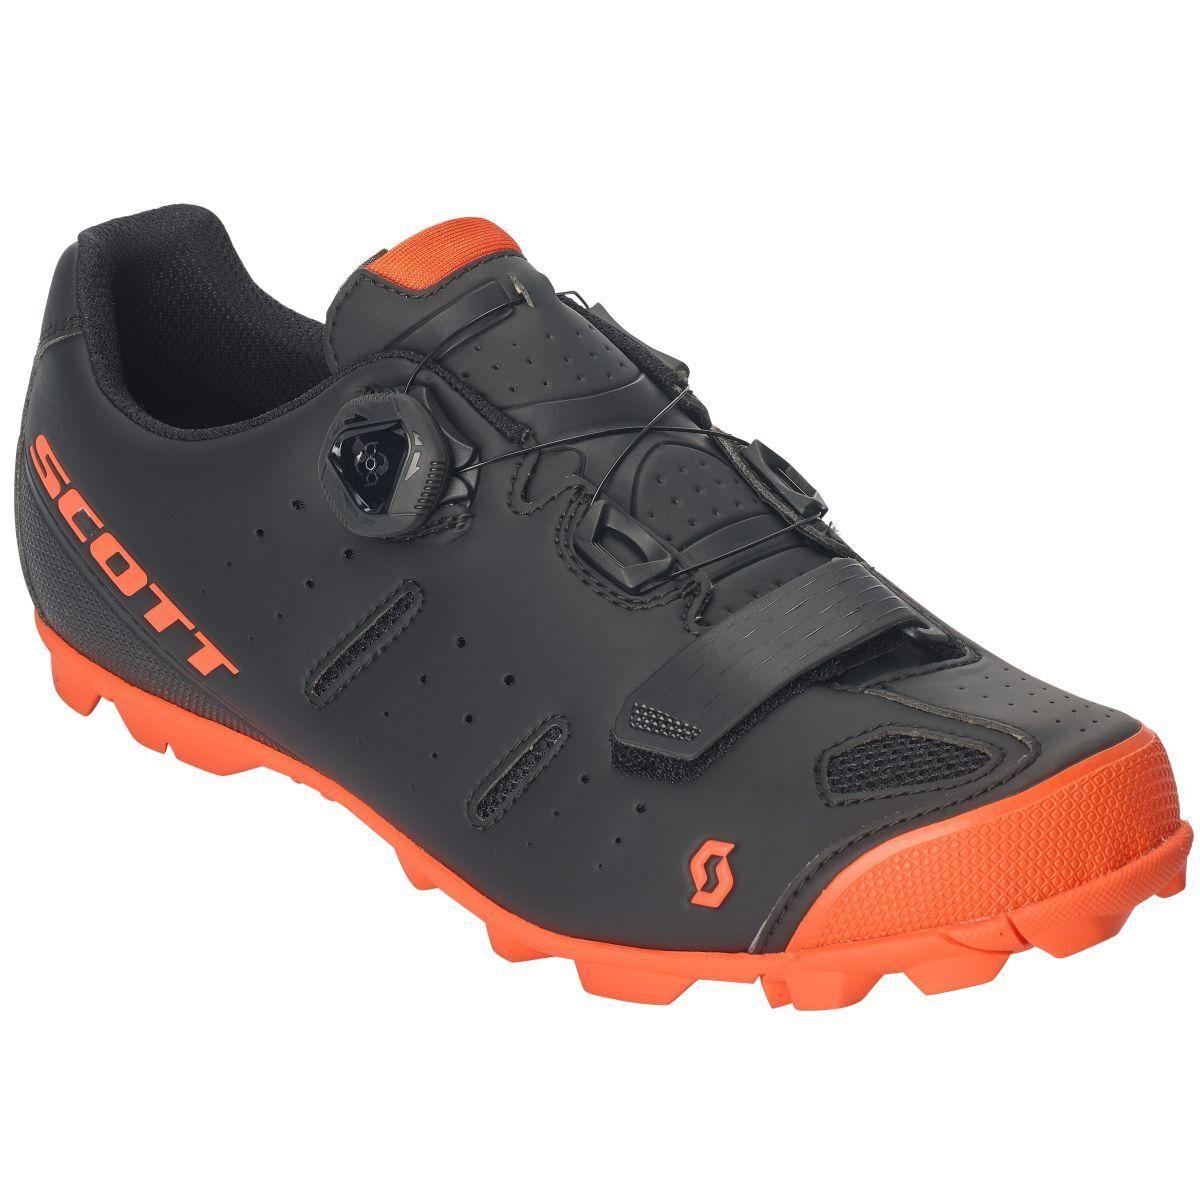 Bicicleta BOA elite Scott MTB zapatos negro naranja 2019